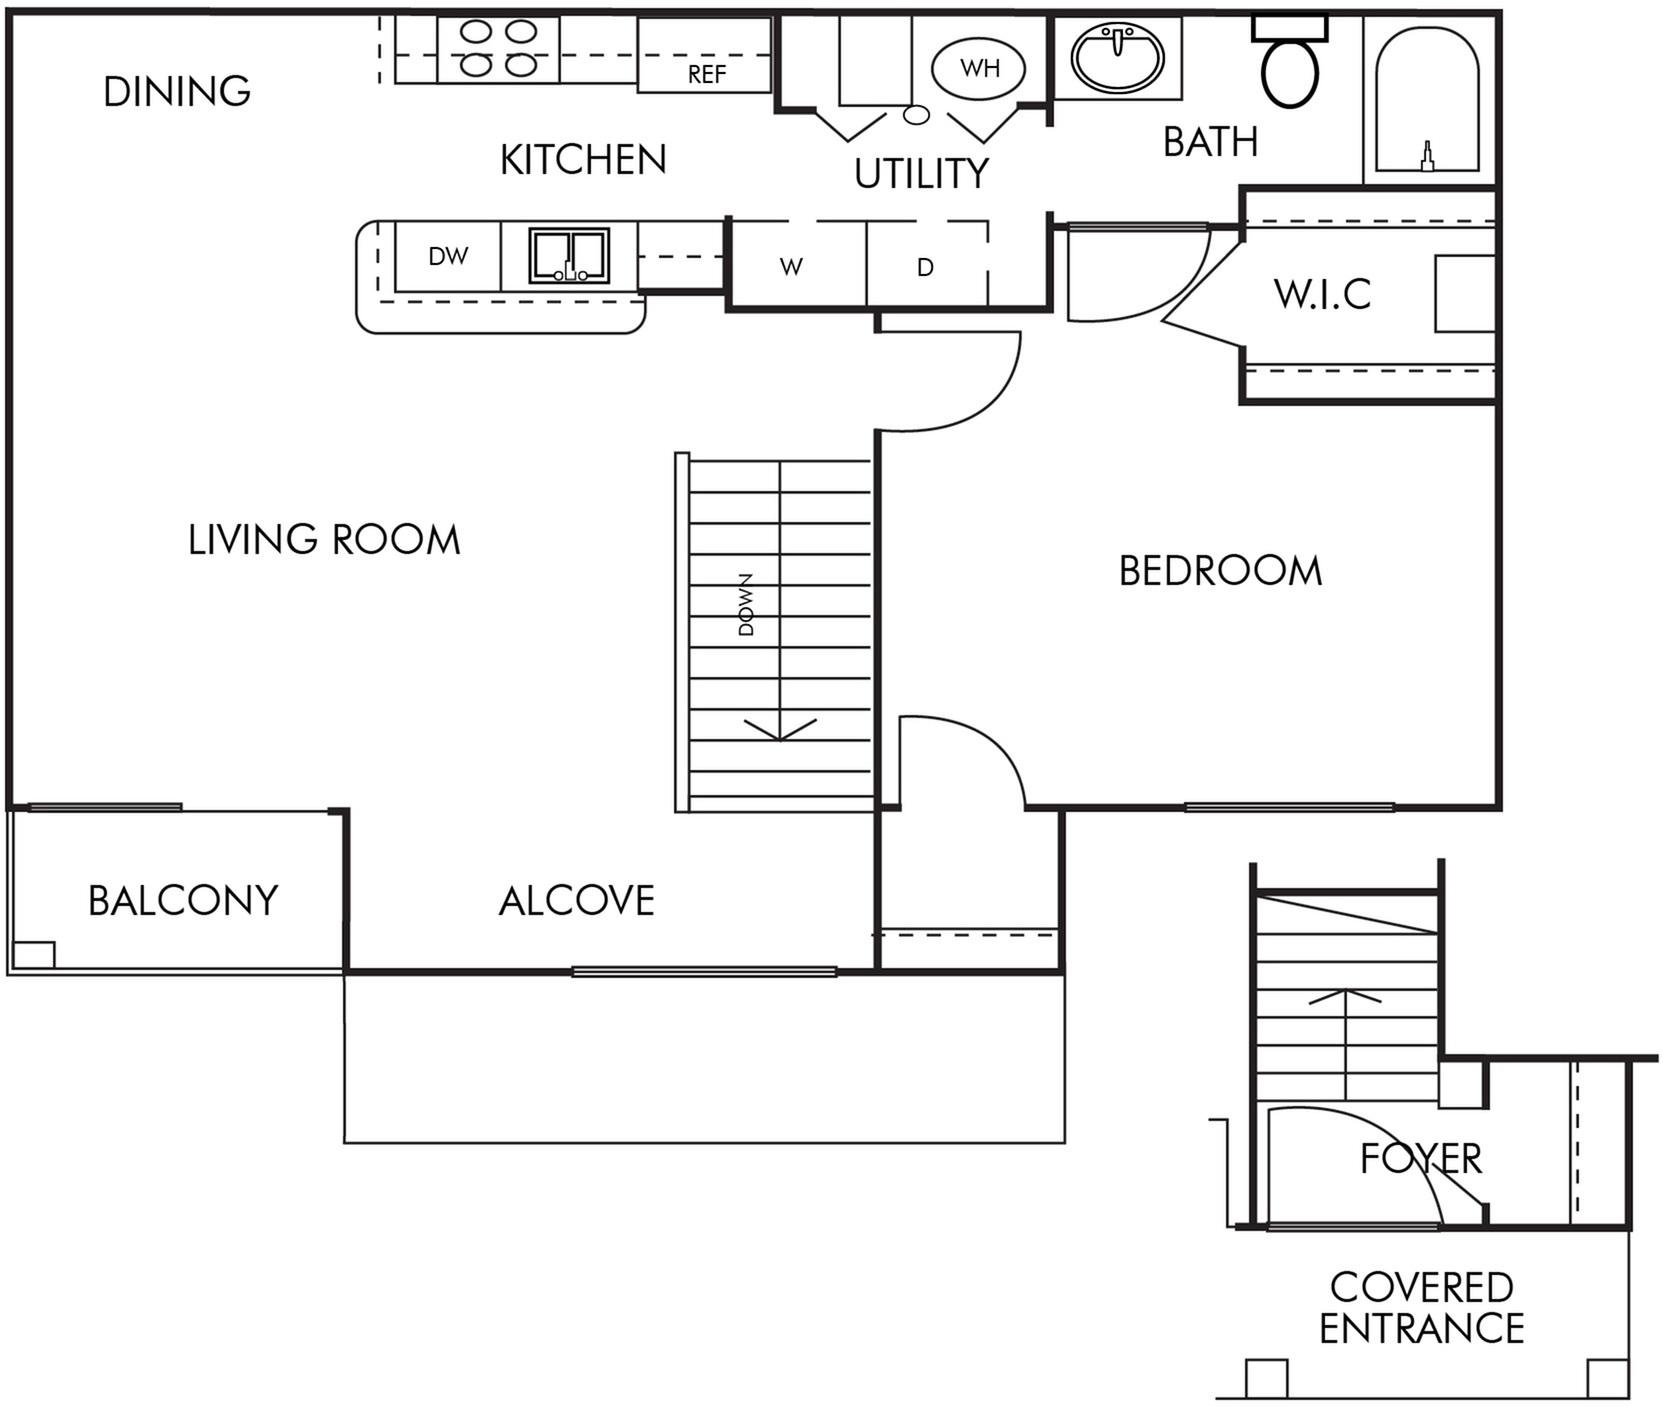 1 Bed 1 Bath- 2nd floor